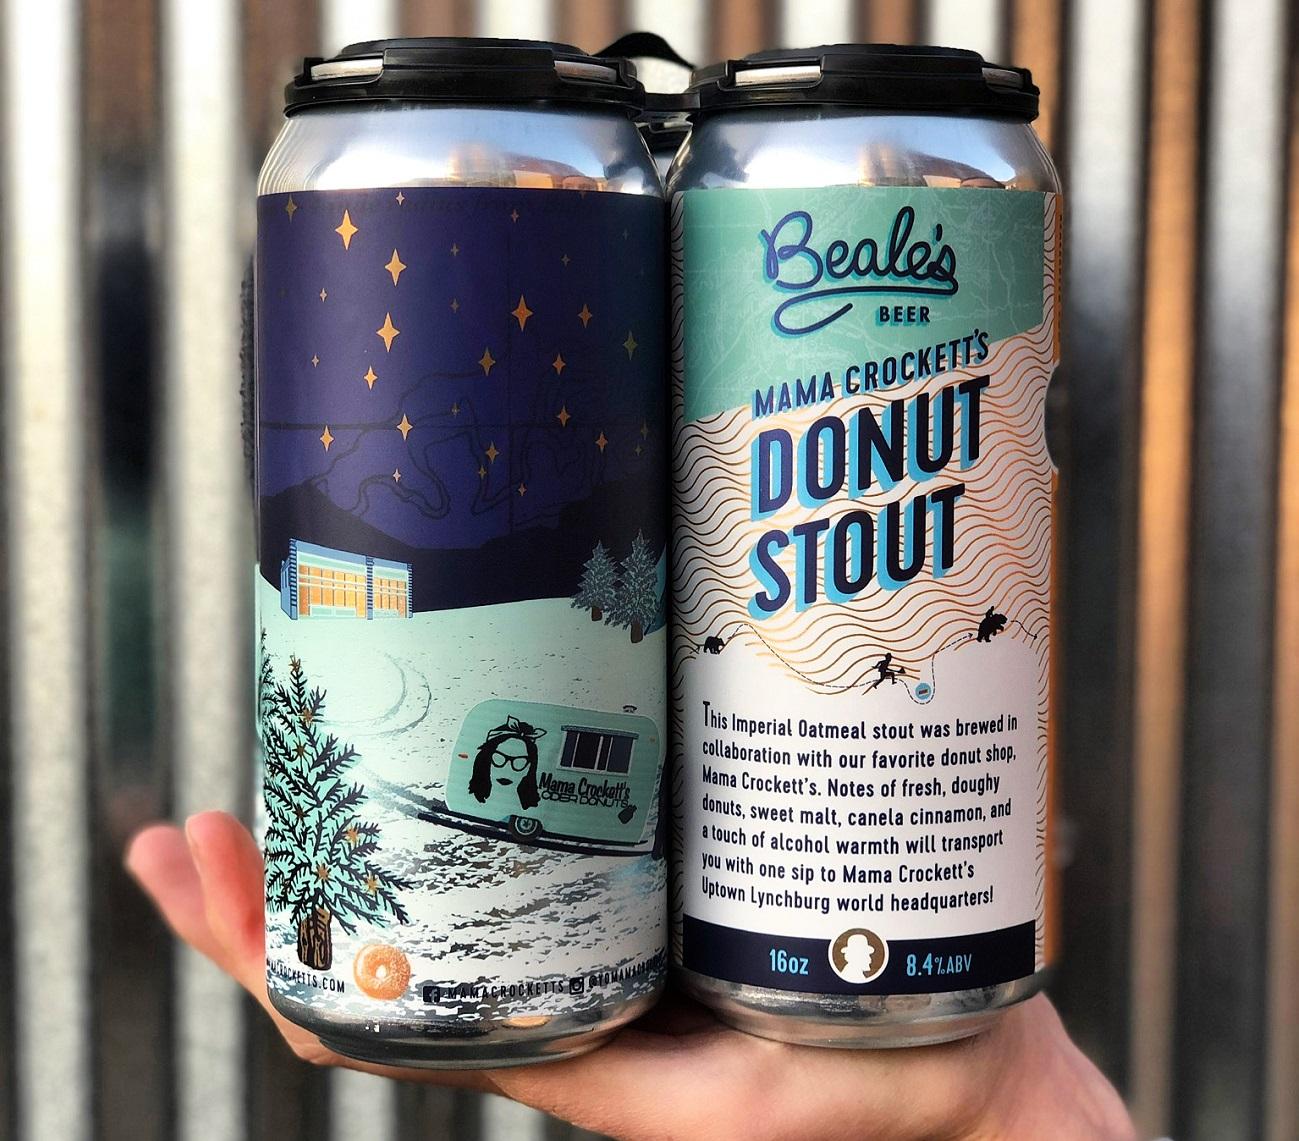 Beale's Mama Crockett's Donut Stout beer